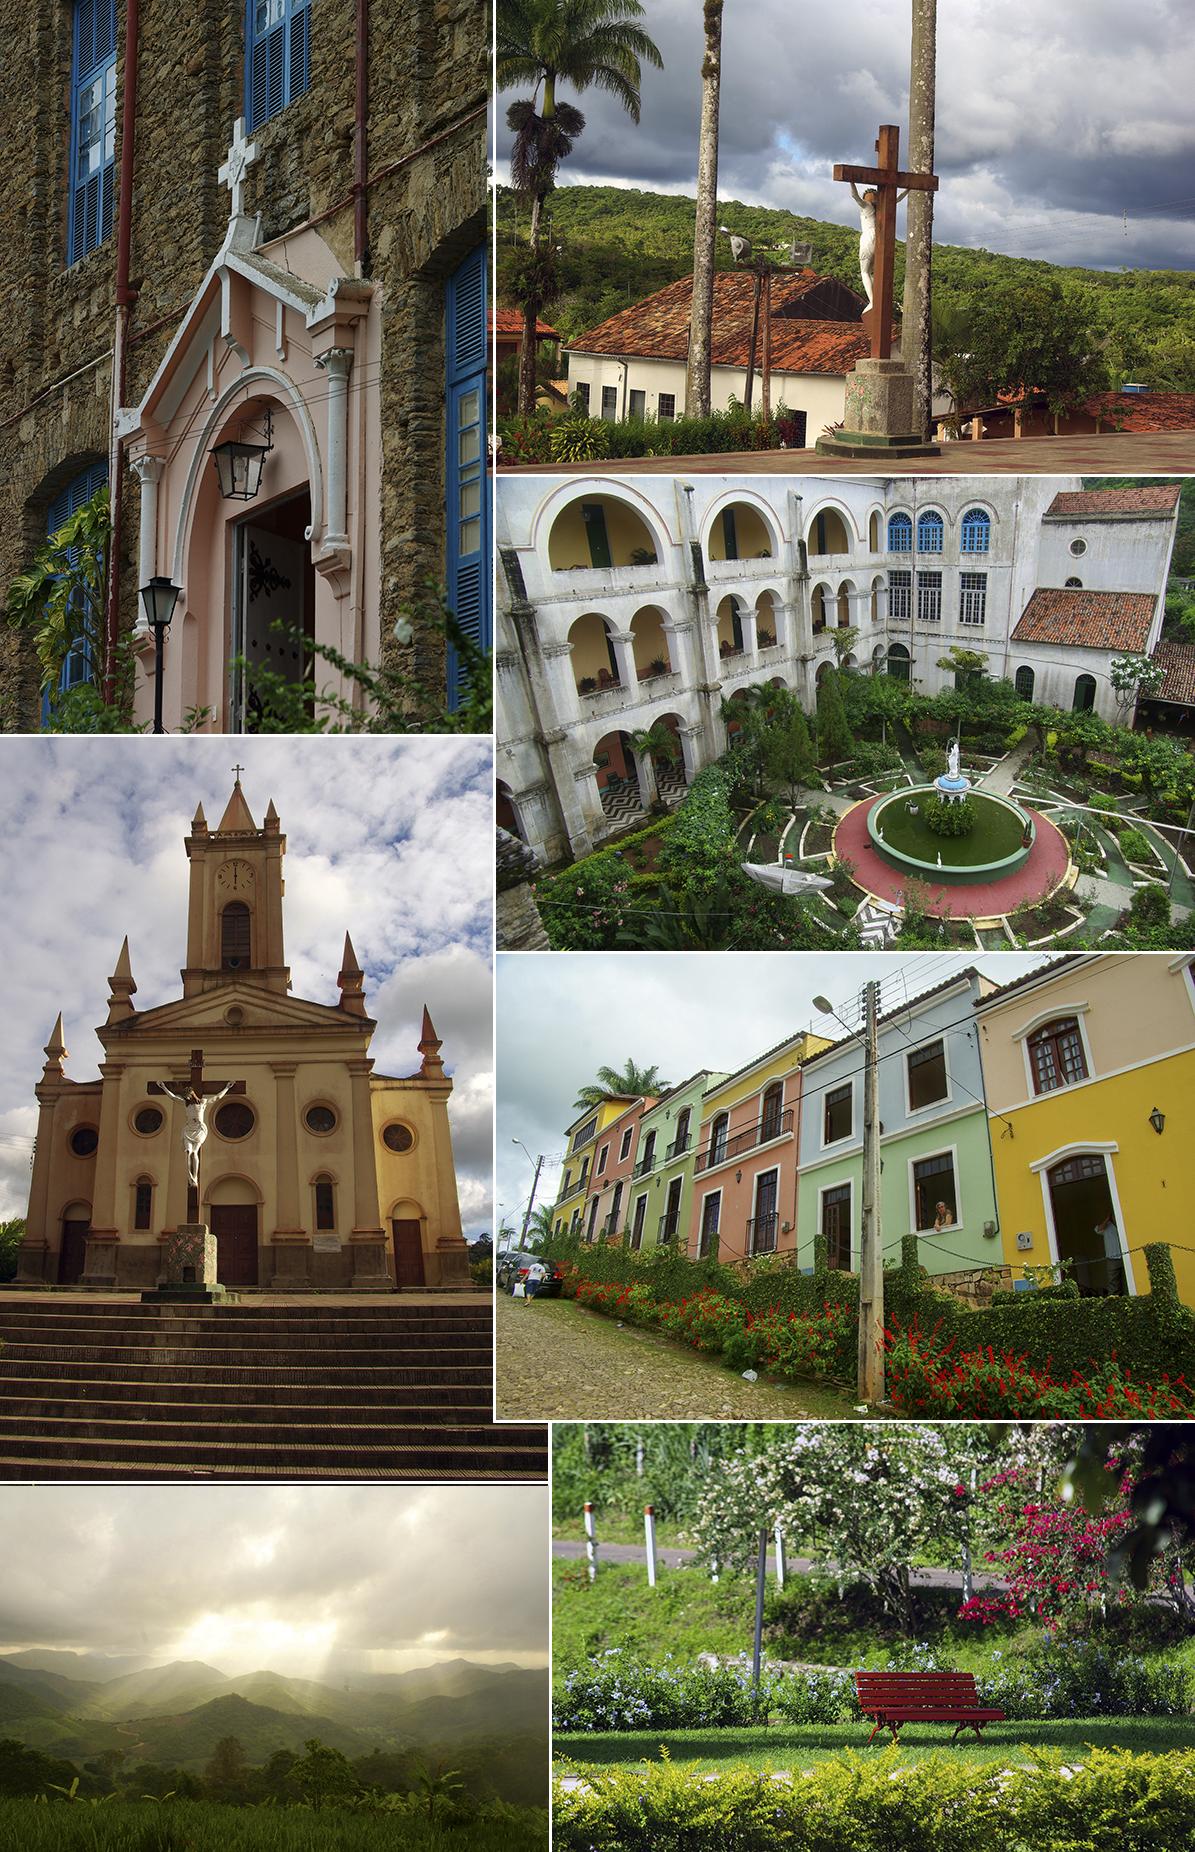 Guaramiranga Ceará fonte: upload.wikimedia.org